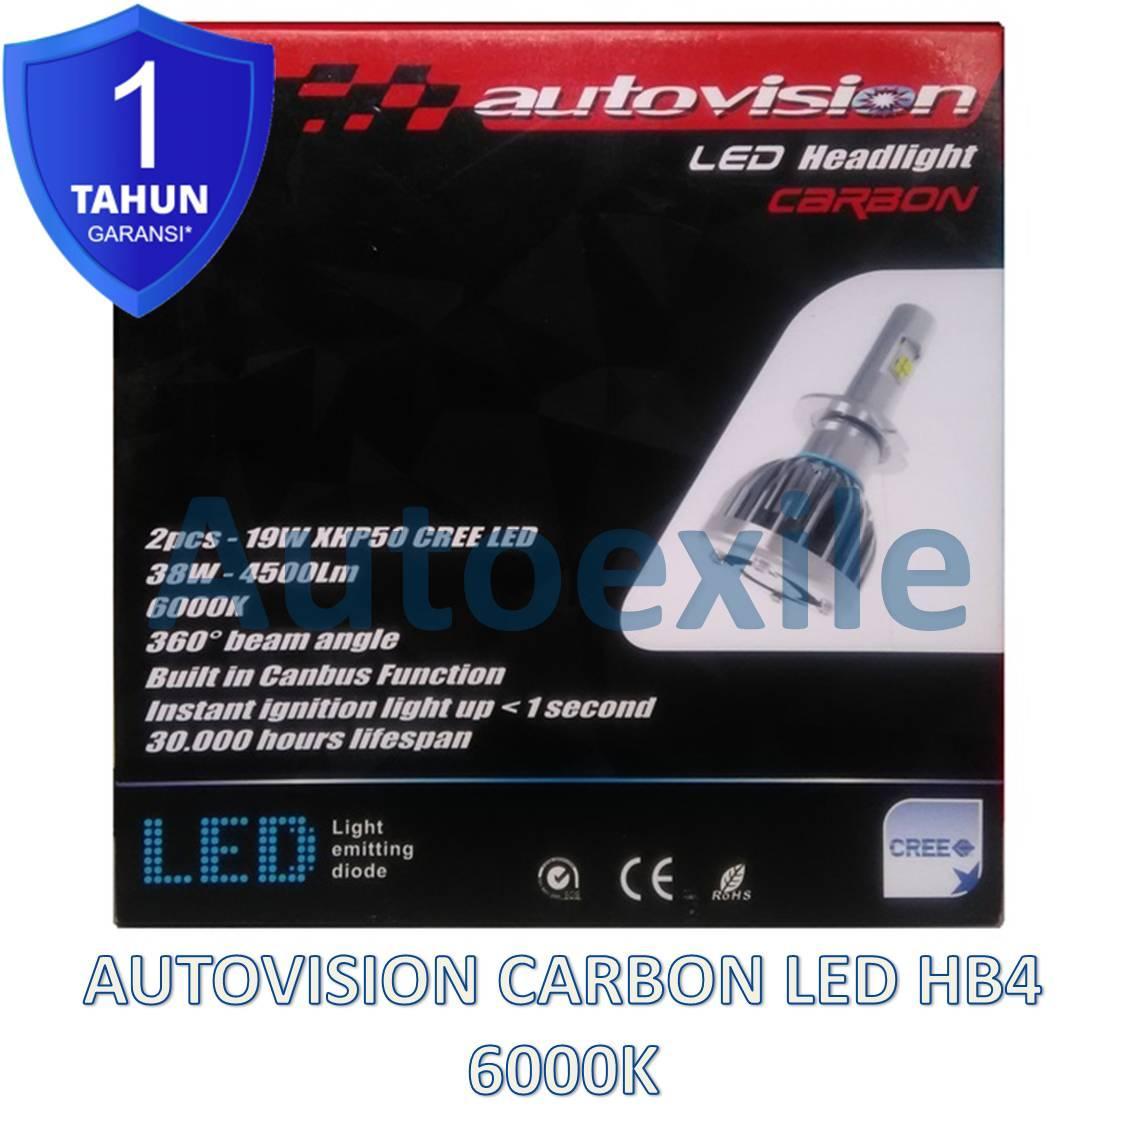 Autovision Carbon LED HB4 9006 38W Canbus 6000K Putih XHP50 CREE Lampu Mobil Civic CRV Fortuner Avanza Innova Landcruiser Elysion Grandis VW Golf Polo